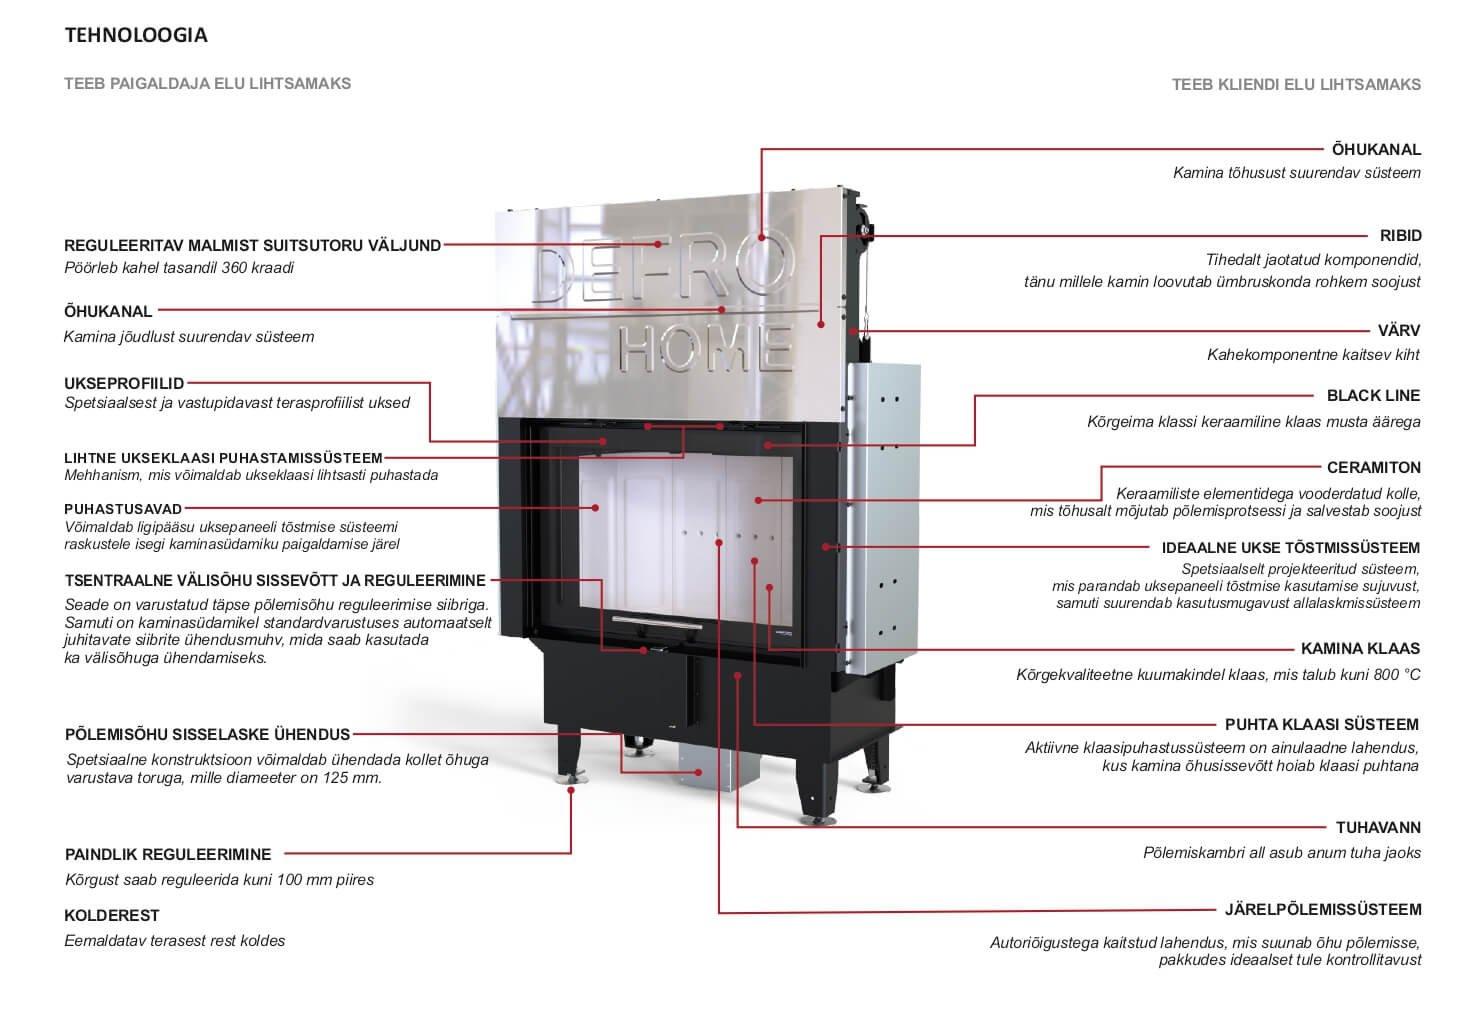 Defro Home Kaminasüdamik Intra G tehnoloogia